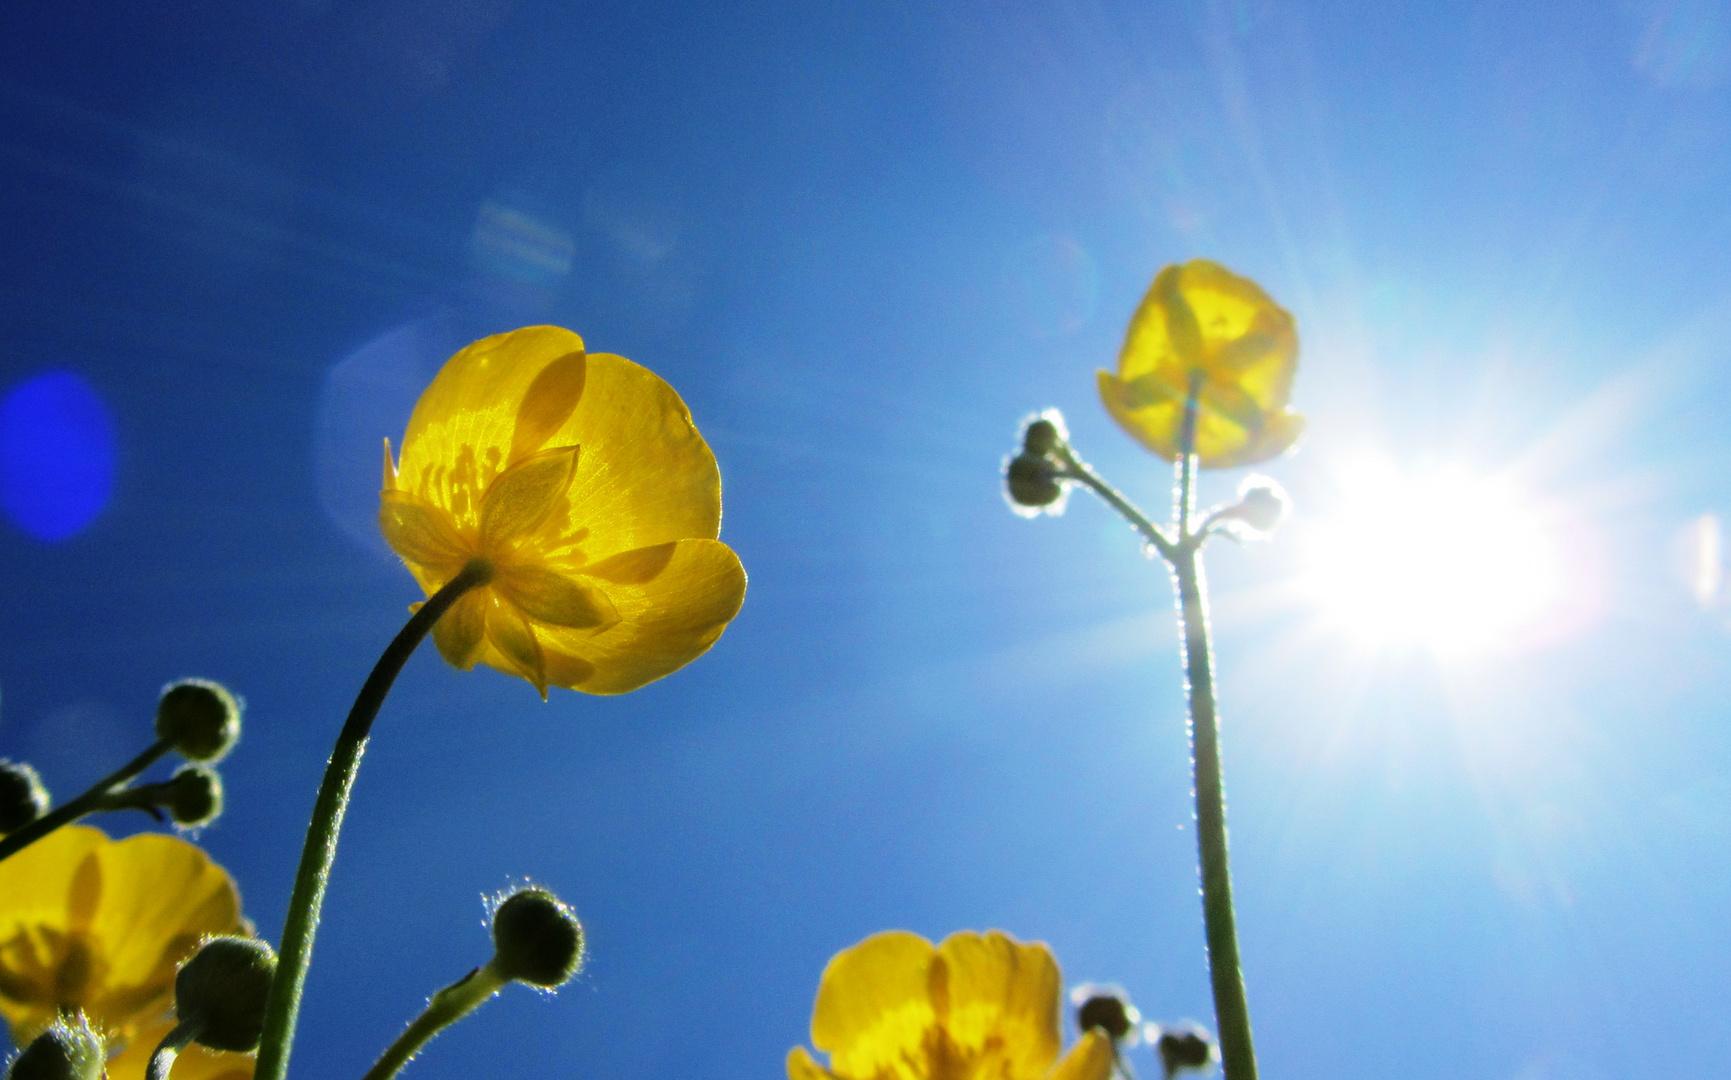 der Sonne entgegen / growing with the sunlight